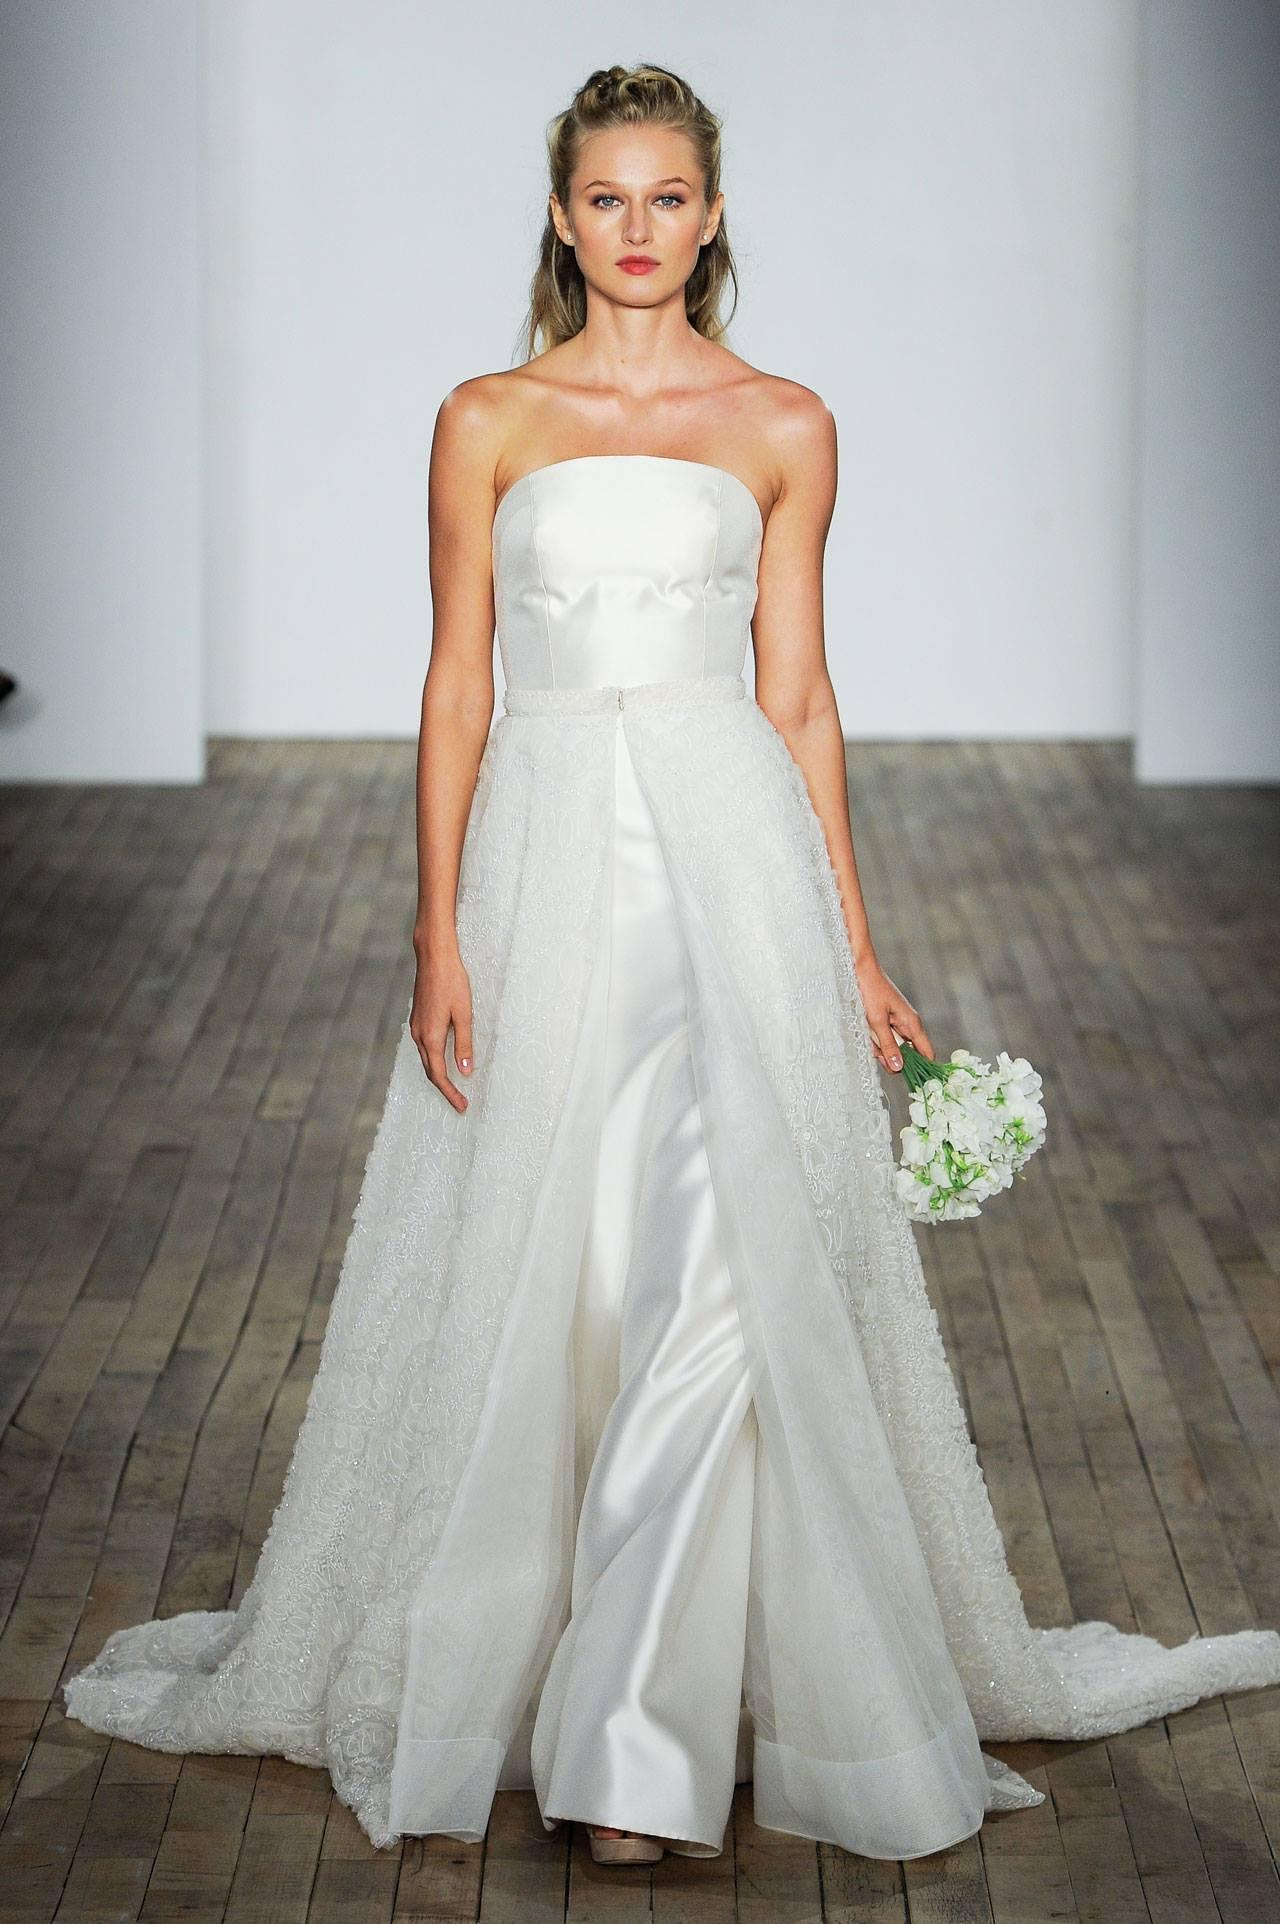 Modele de rochie de mireasa - Rochia salopeta - Wedding Consulting by Marian Ionescu